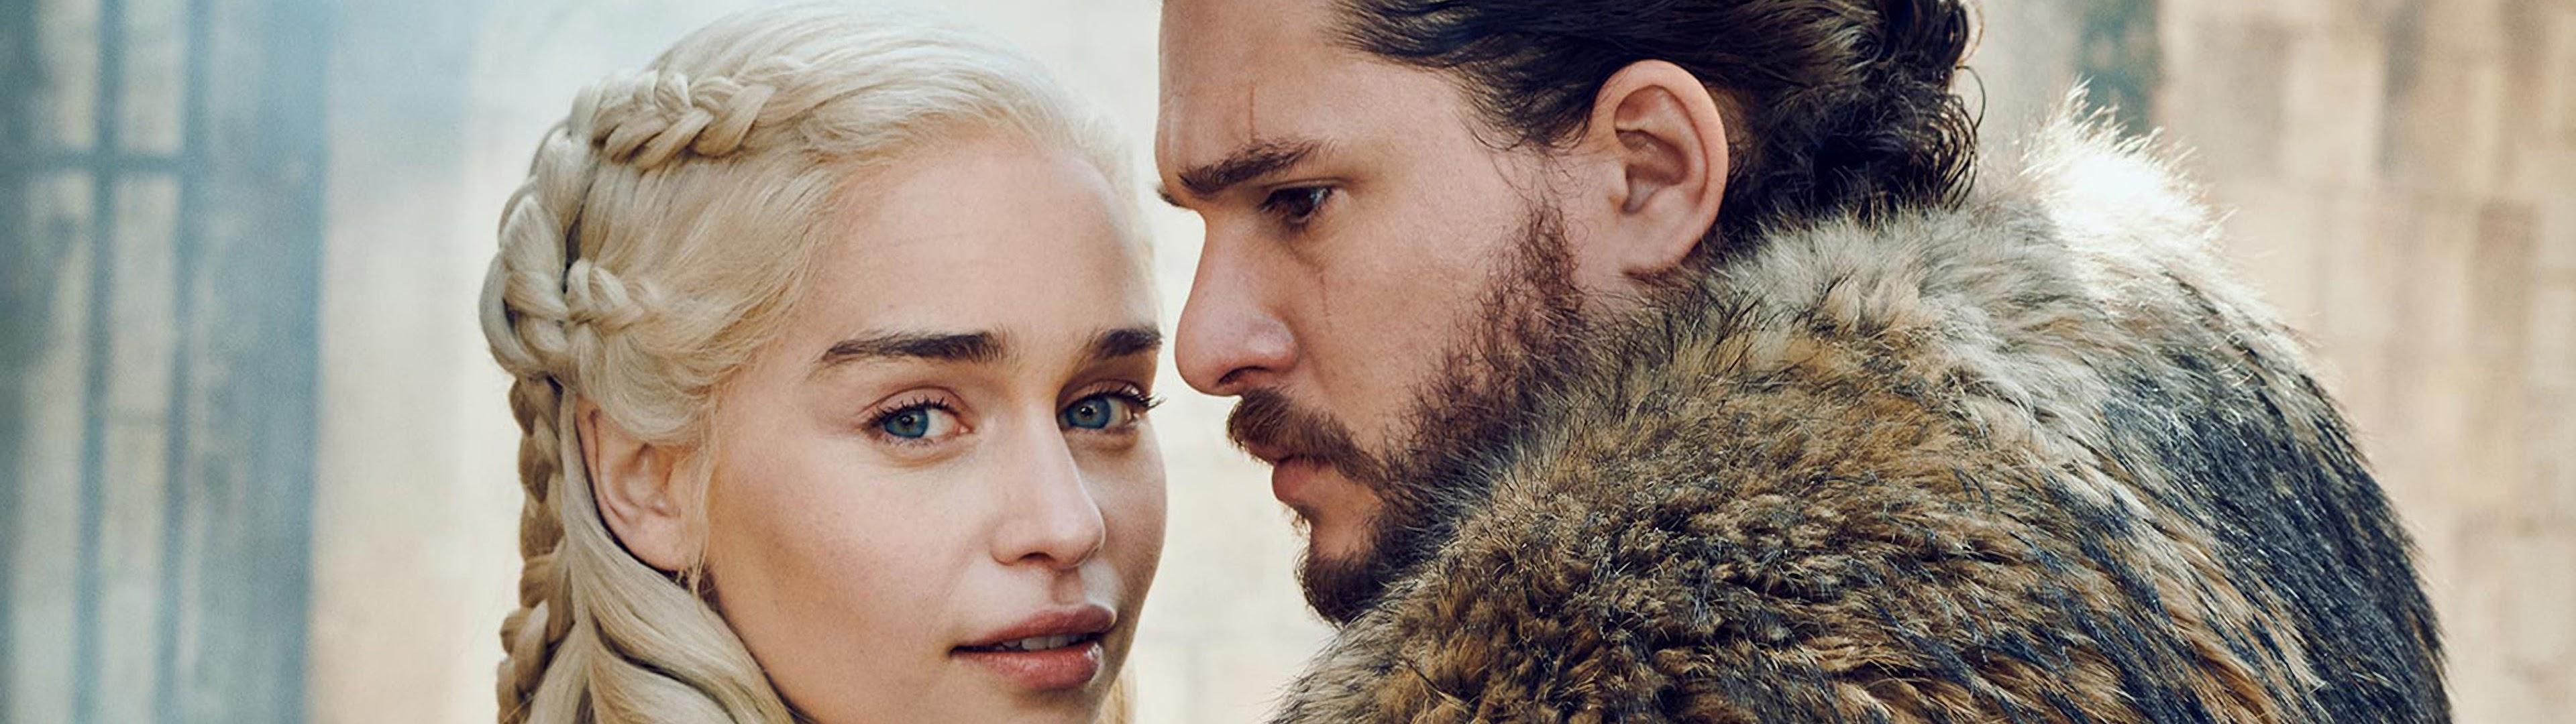 Daenerys Targaryen Jon Snow Game Of Thrones Season 8 4k Wallpaper 42